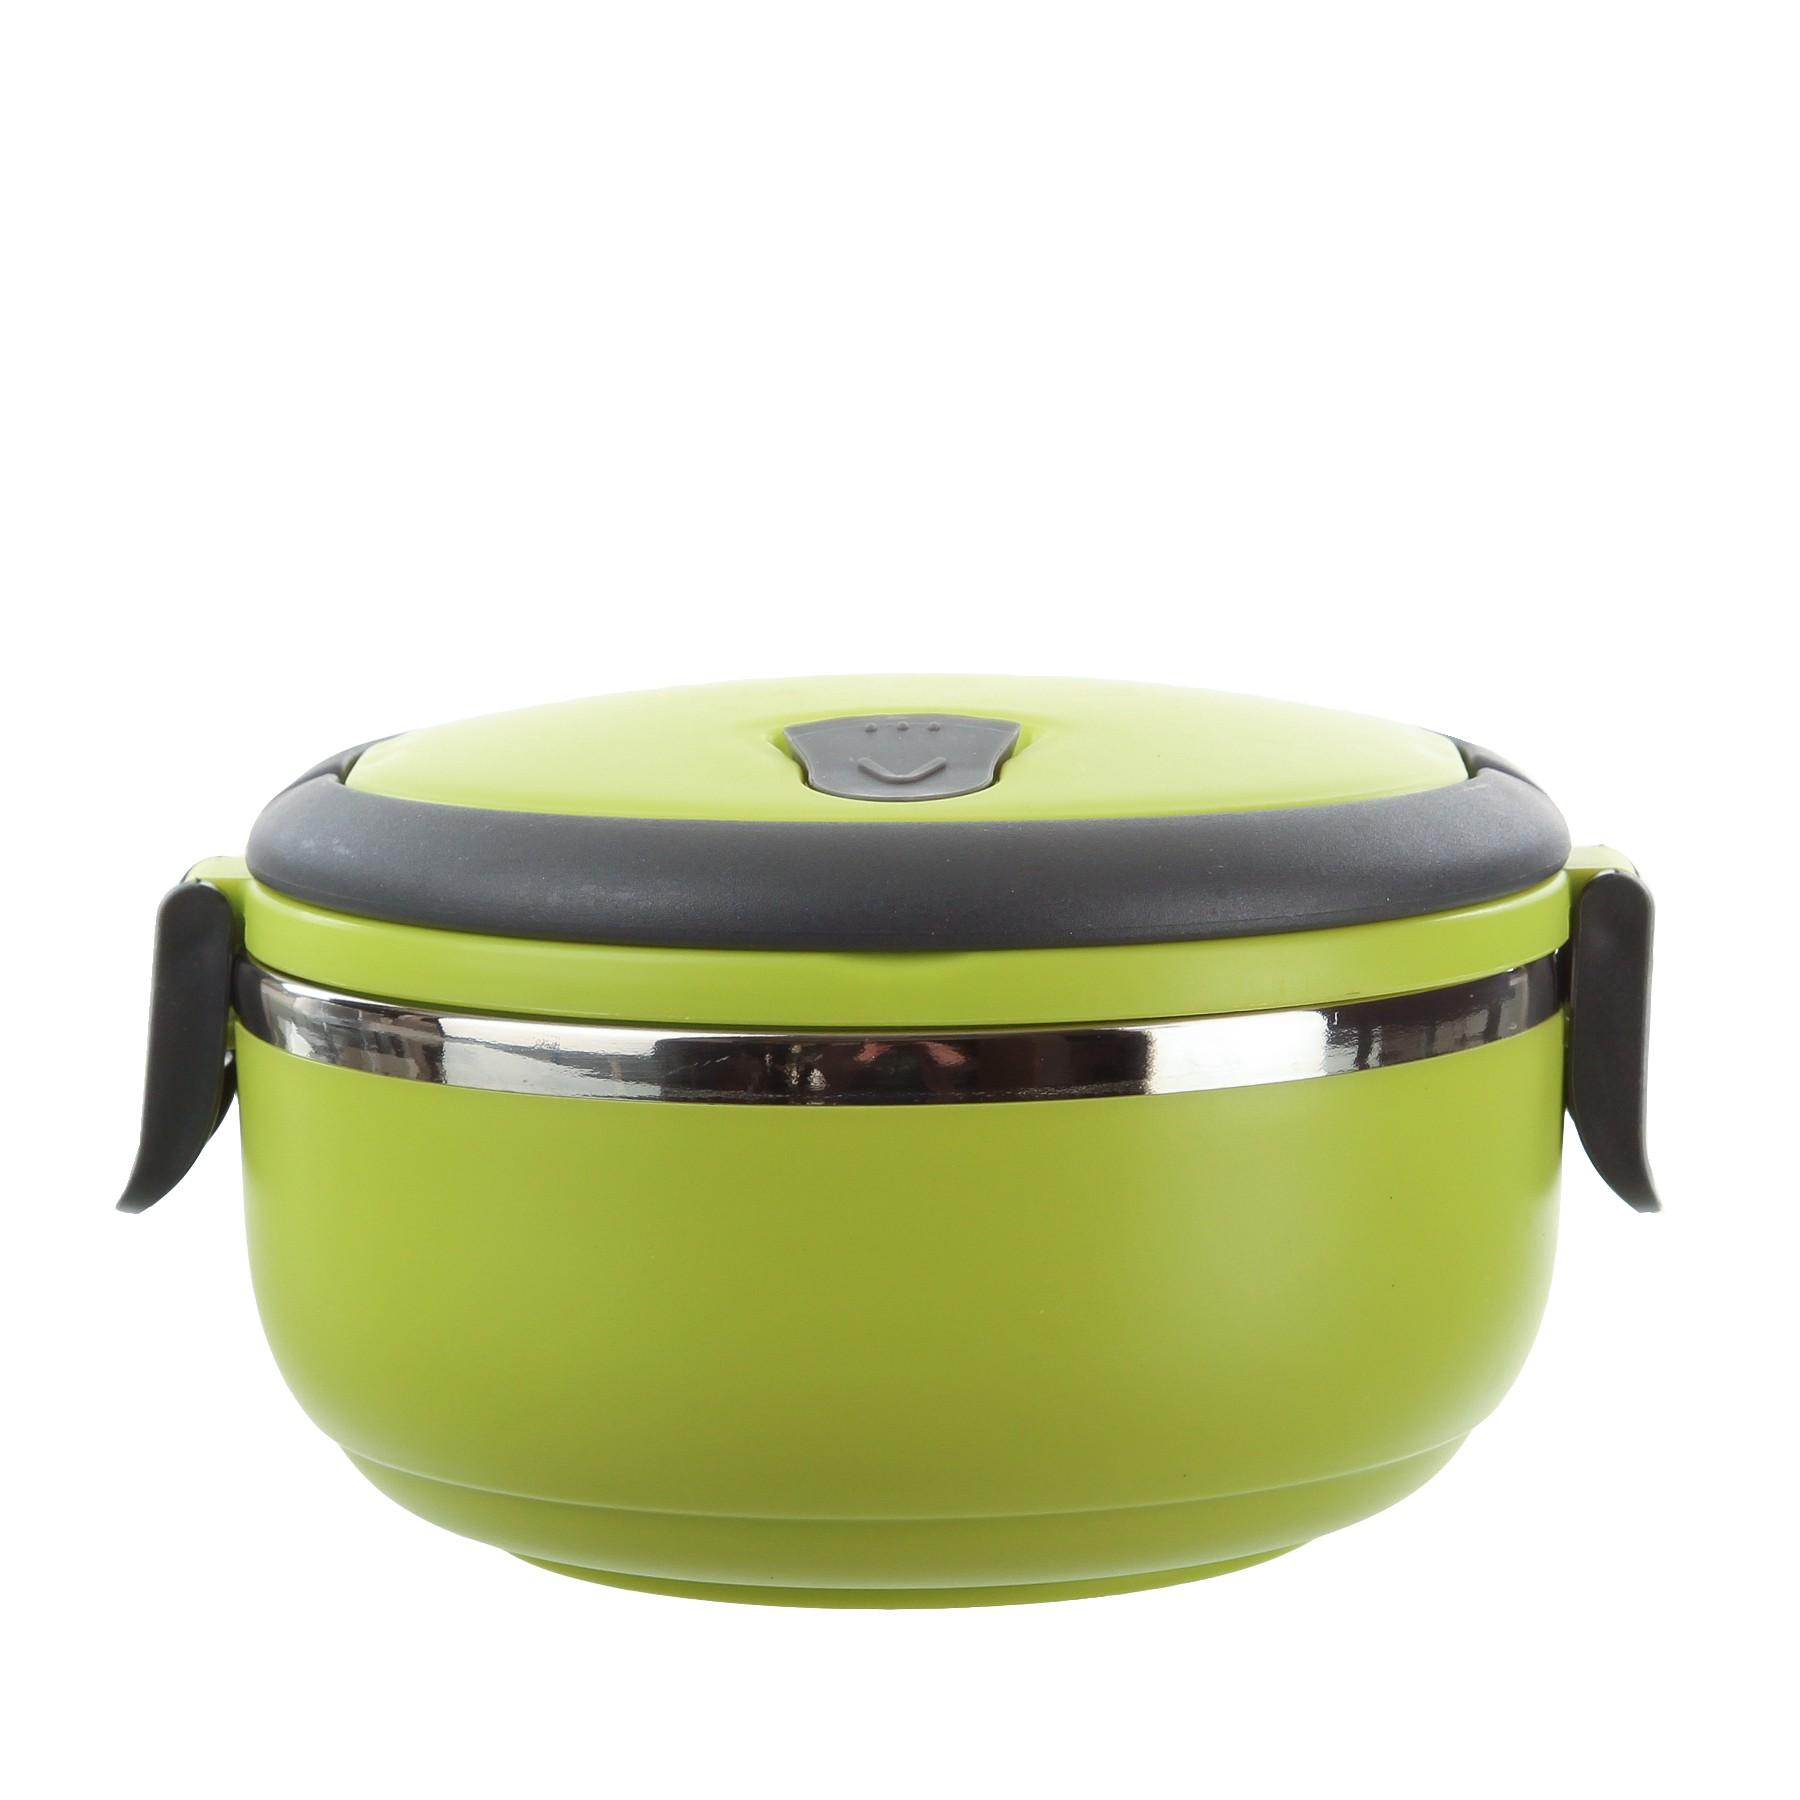 Suppen Lunch Box mit Deckel Bild https://cdn03.plentymarkets.com/zsy4vjx32p87/item/images/5029/full/13047-ama-02.JPG